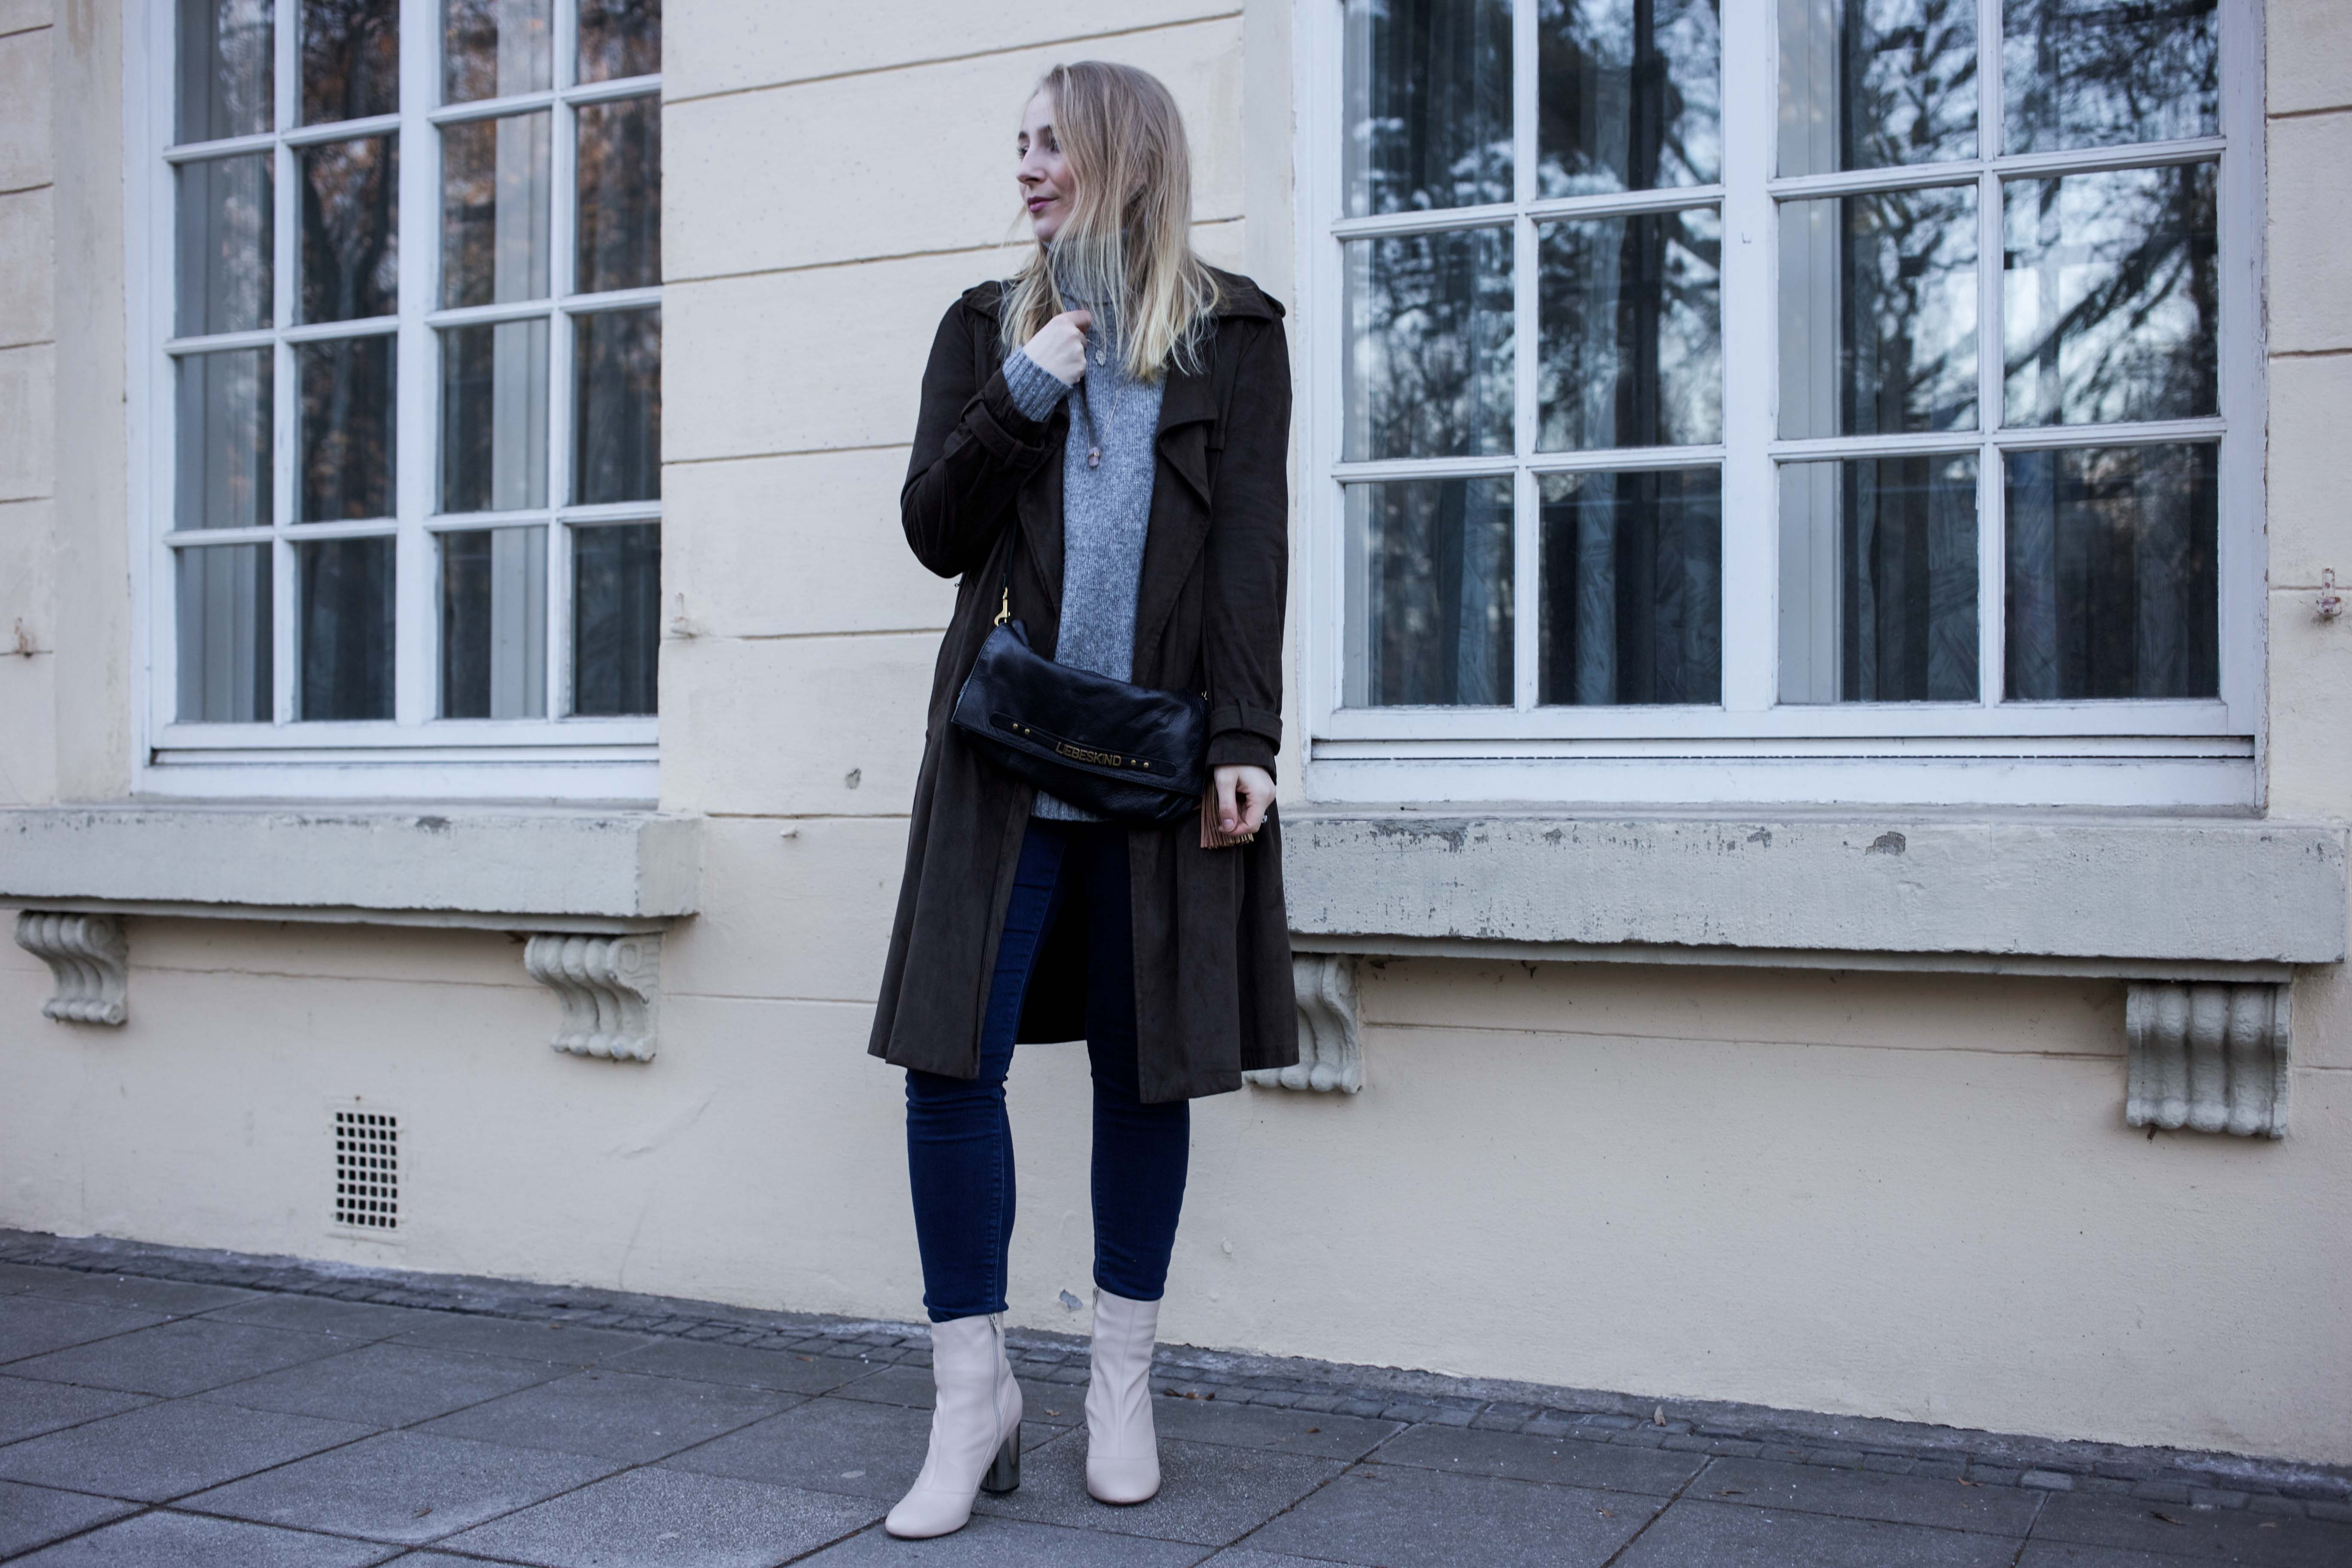 turtleneck-trench-coat-streetstyle-modeblog-fashionblog-bonn-berlin-köln-lederstiefel-silberabsatz-outfi_9203